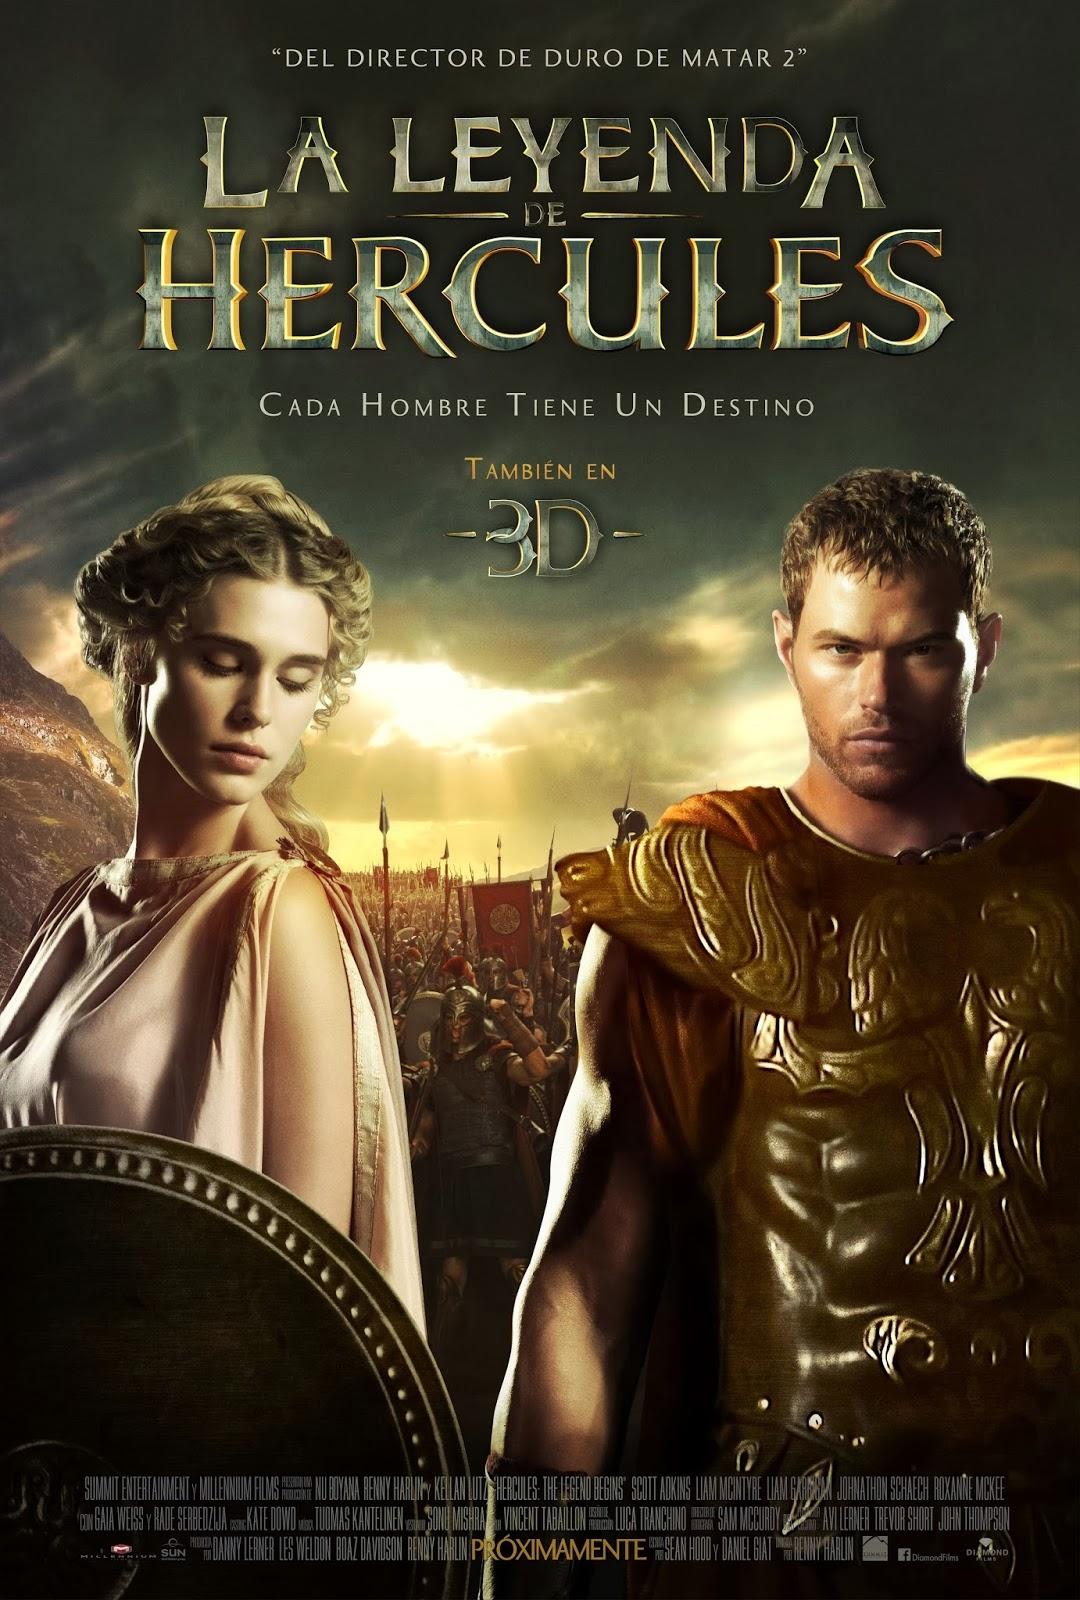 Hercules 3D Movie starring Kellan Lutz : Teaser Trailer |Kellan Lutz Hercules Poster